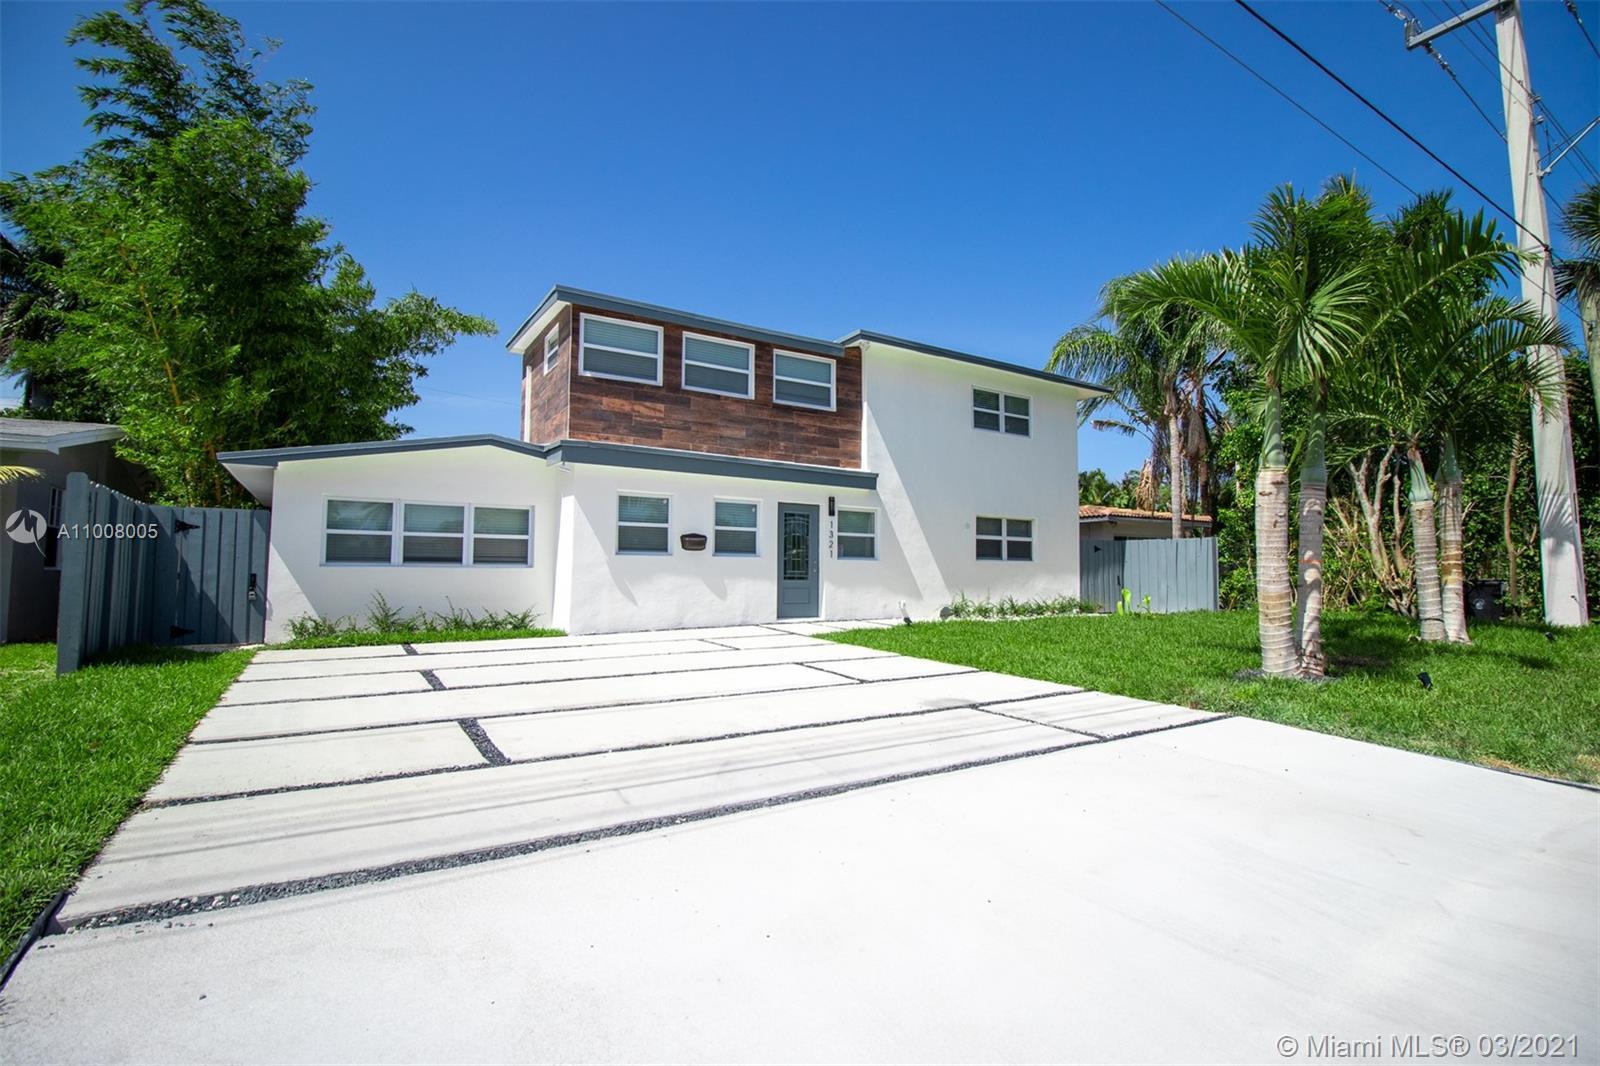 Poinsettia Heights - 1321 NE 14th St, Fort Lauderdale, FL 33304